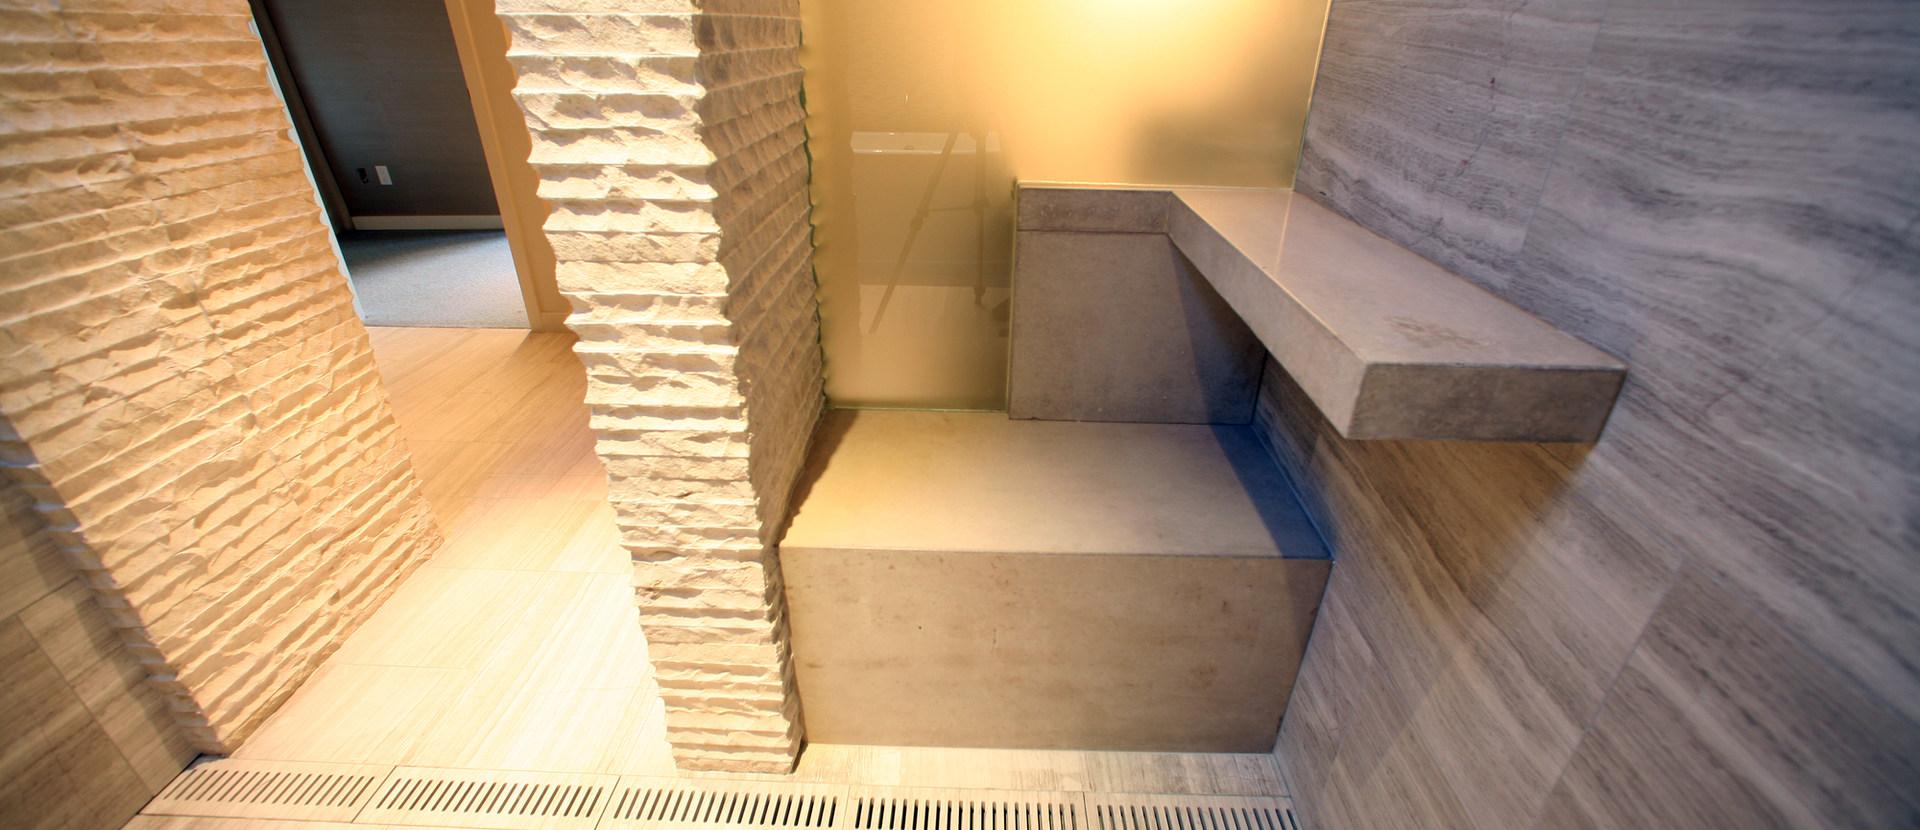 WALK-IN MASTER BATH SHOWER ROOM